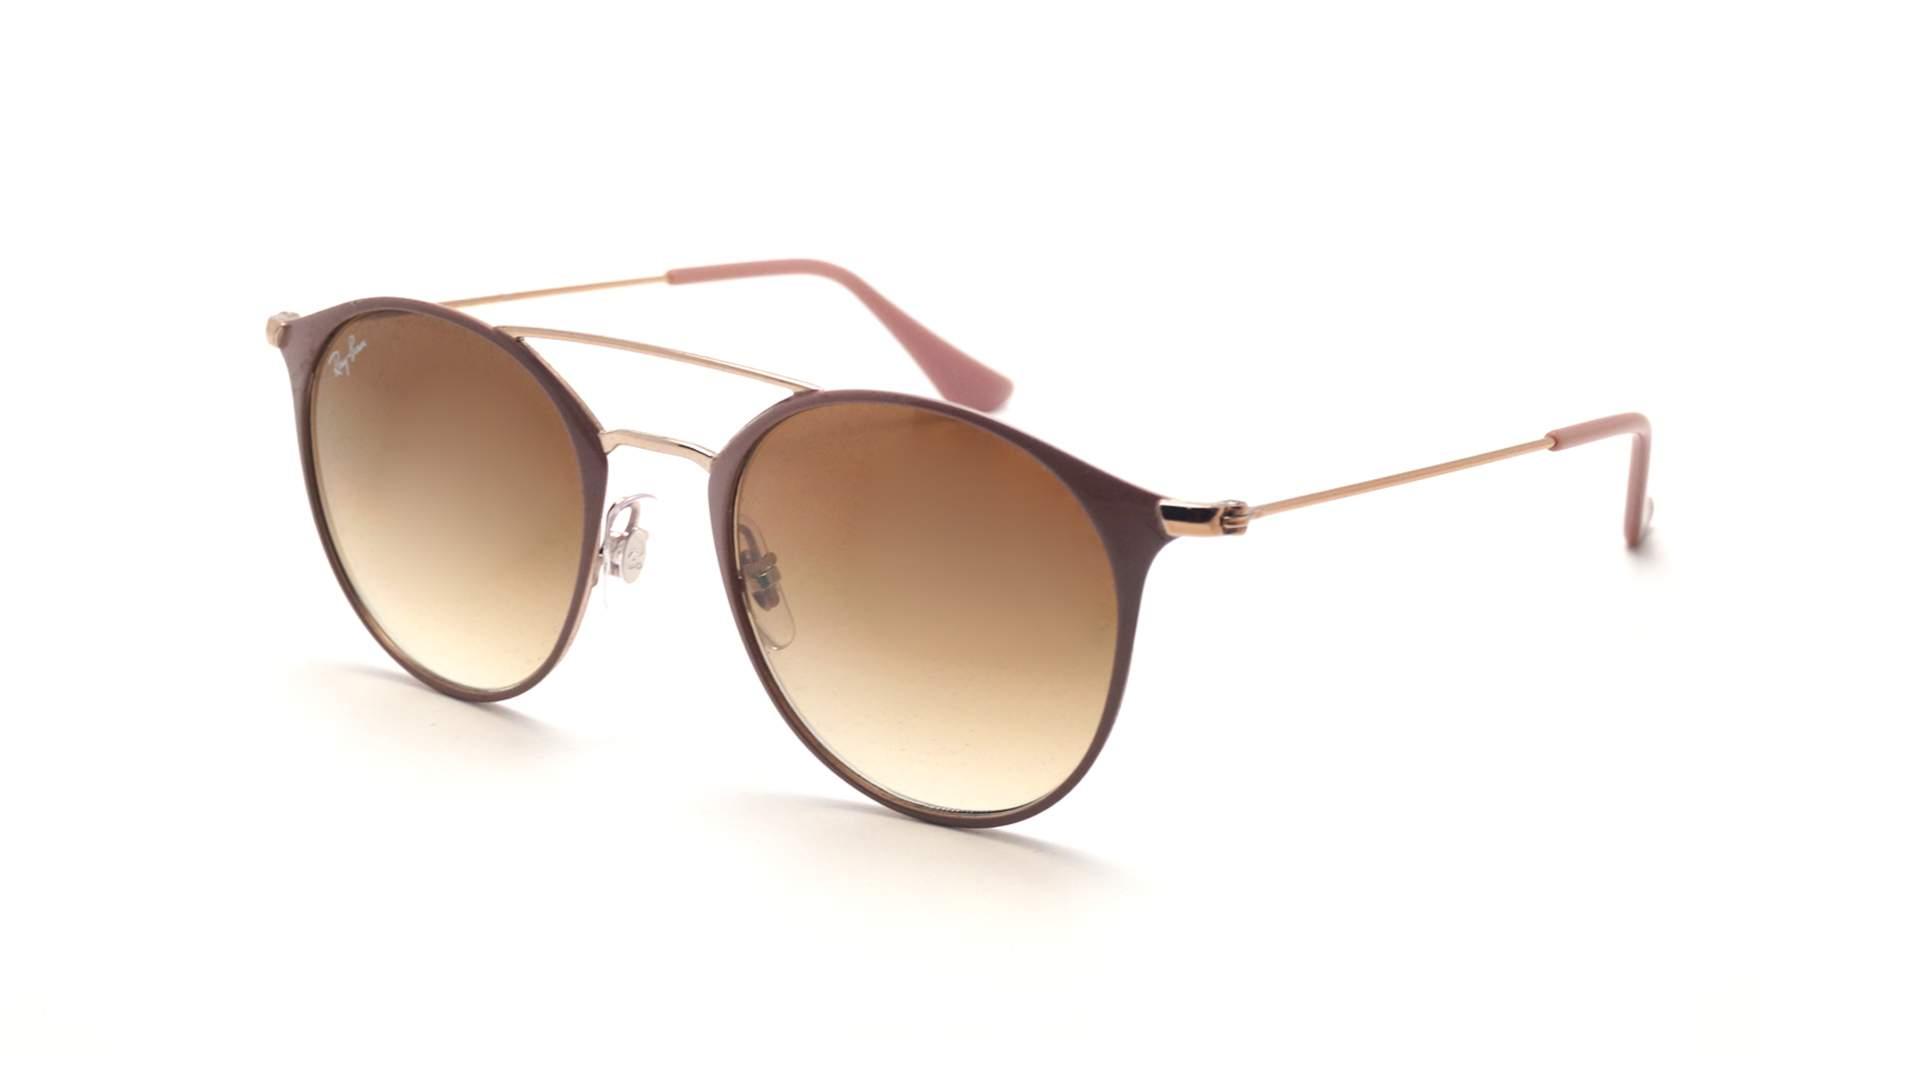 daaa05b4f4a8 Sunglasses Ray-Ban RB3546 9071/51 49-20 Brown Small Gradient